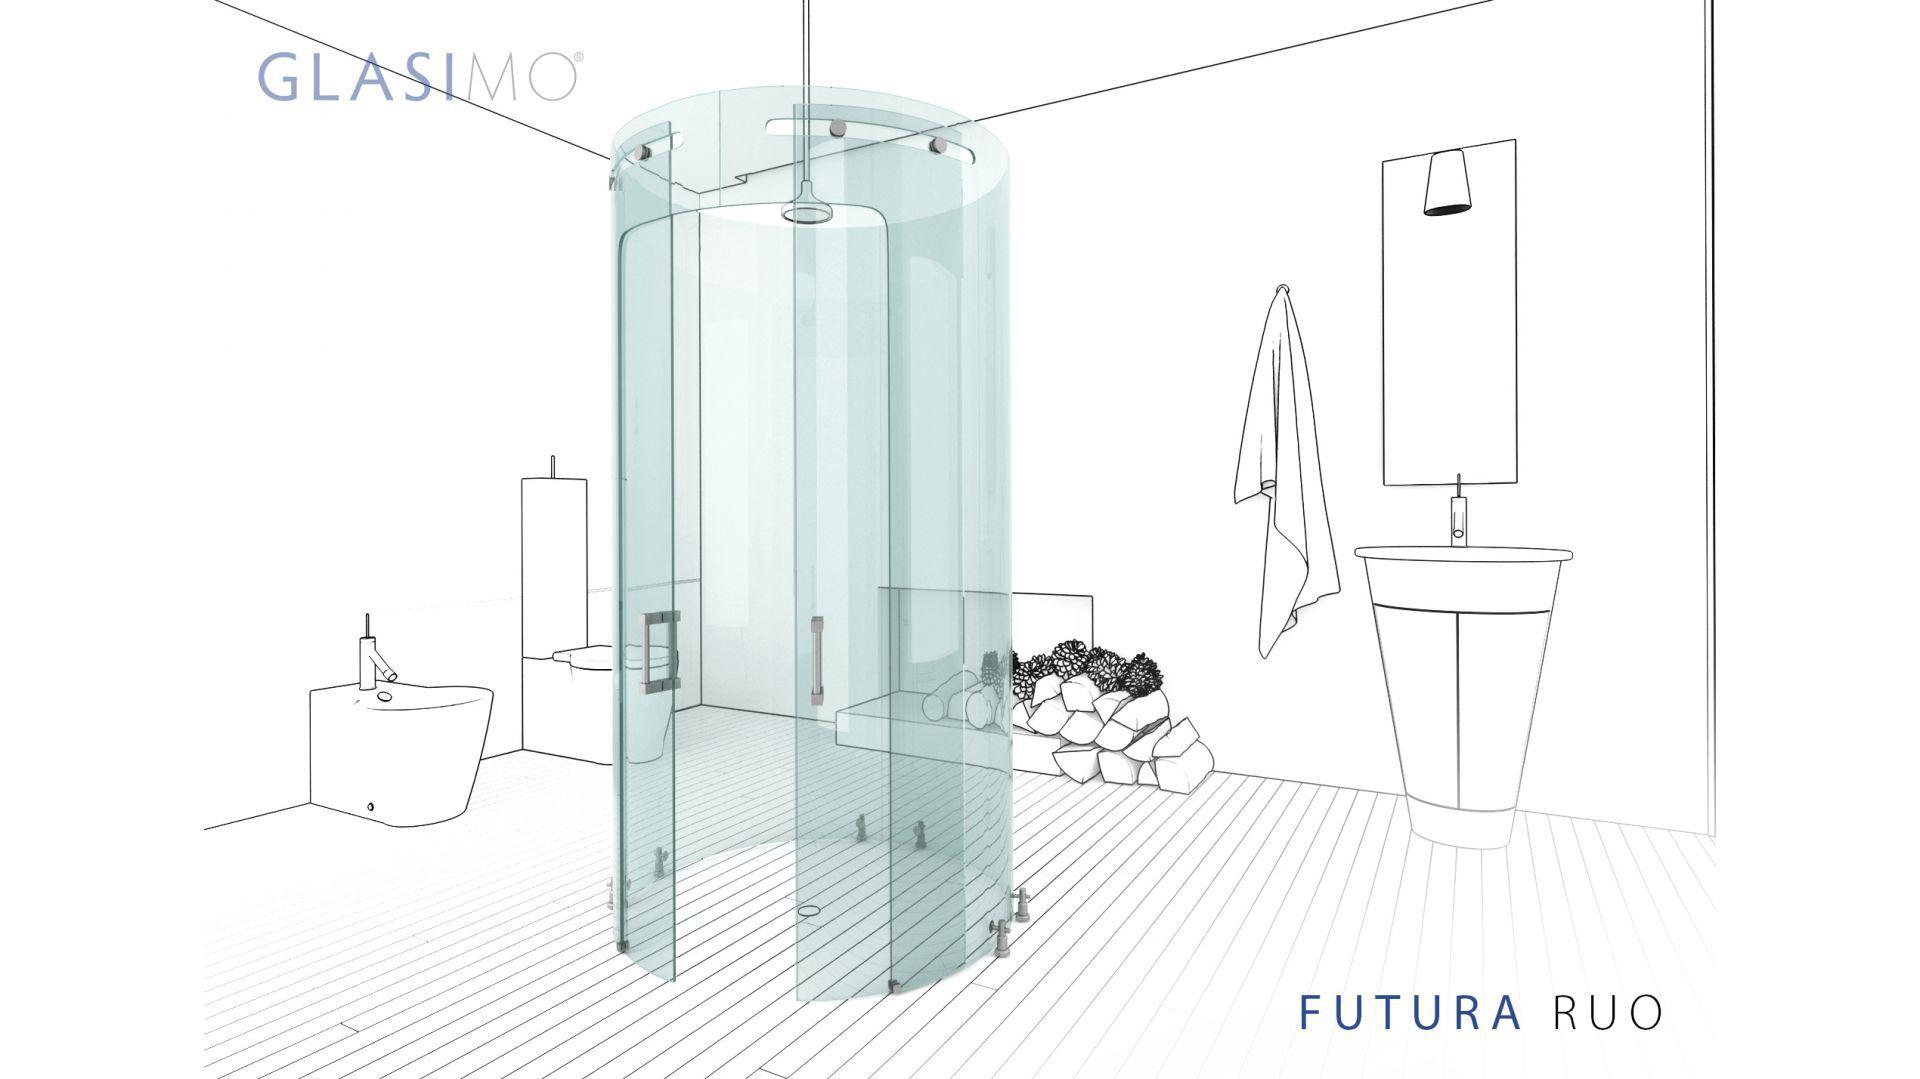 Glasimo Futura Mochnik Produkt Zgloszony Do Konkursu Dobry Design